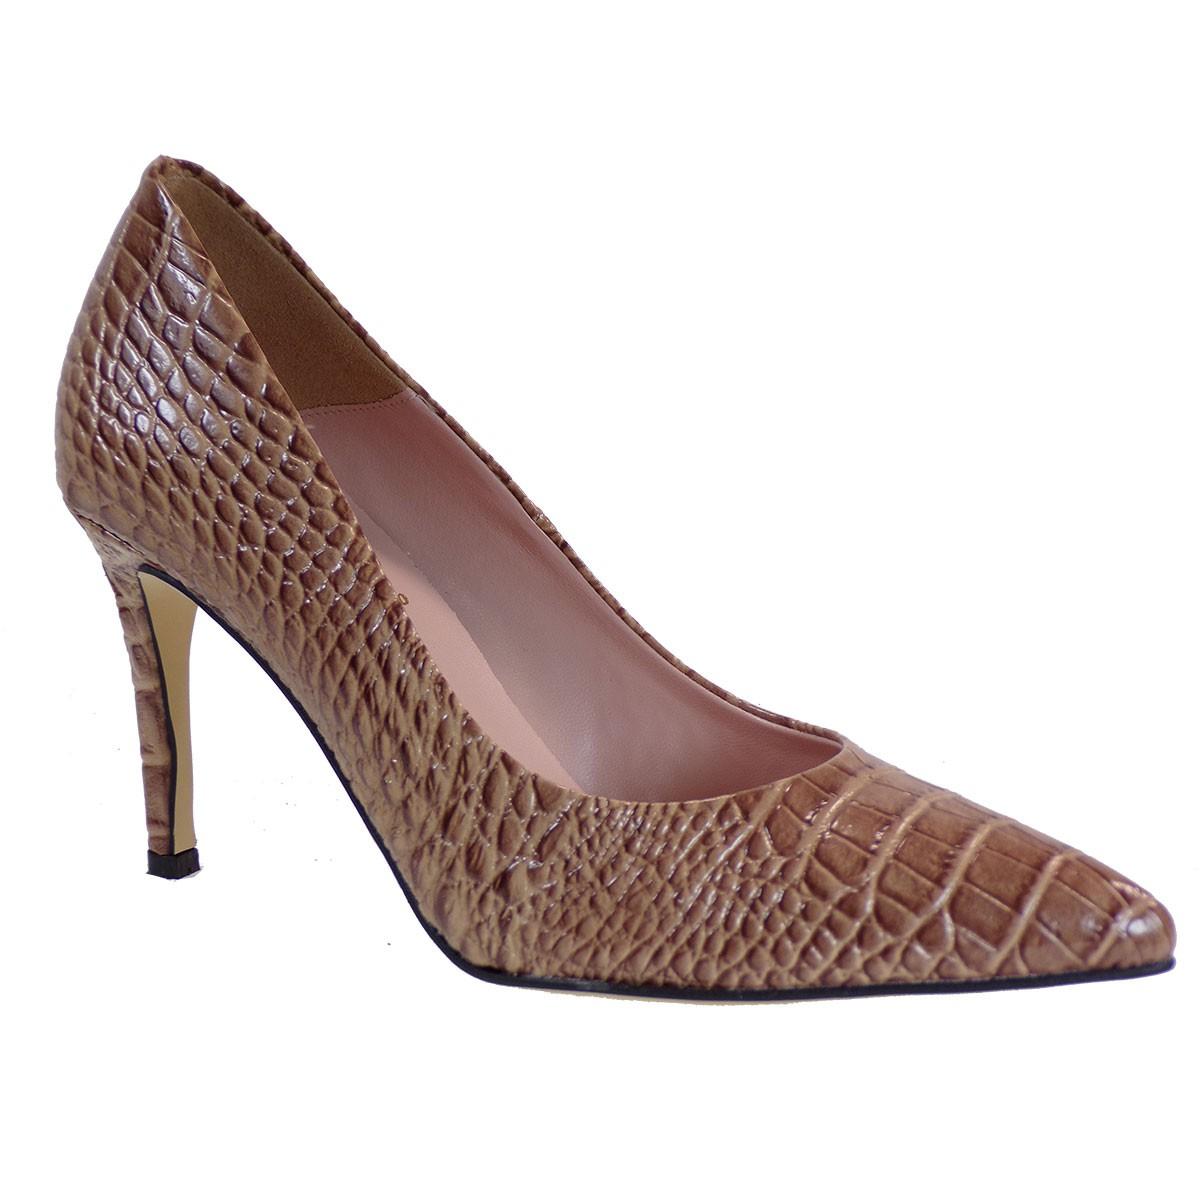 Alessandra Paggioti Γυναικεία Παπούτσια Γόβες 81001 Νude Σκ. Κροκό